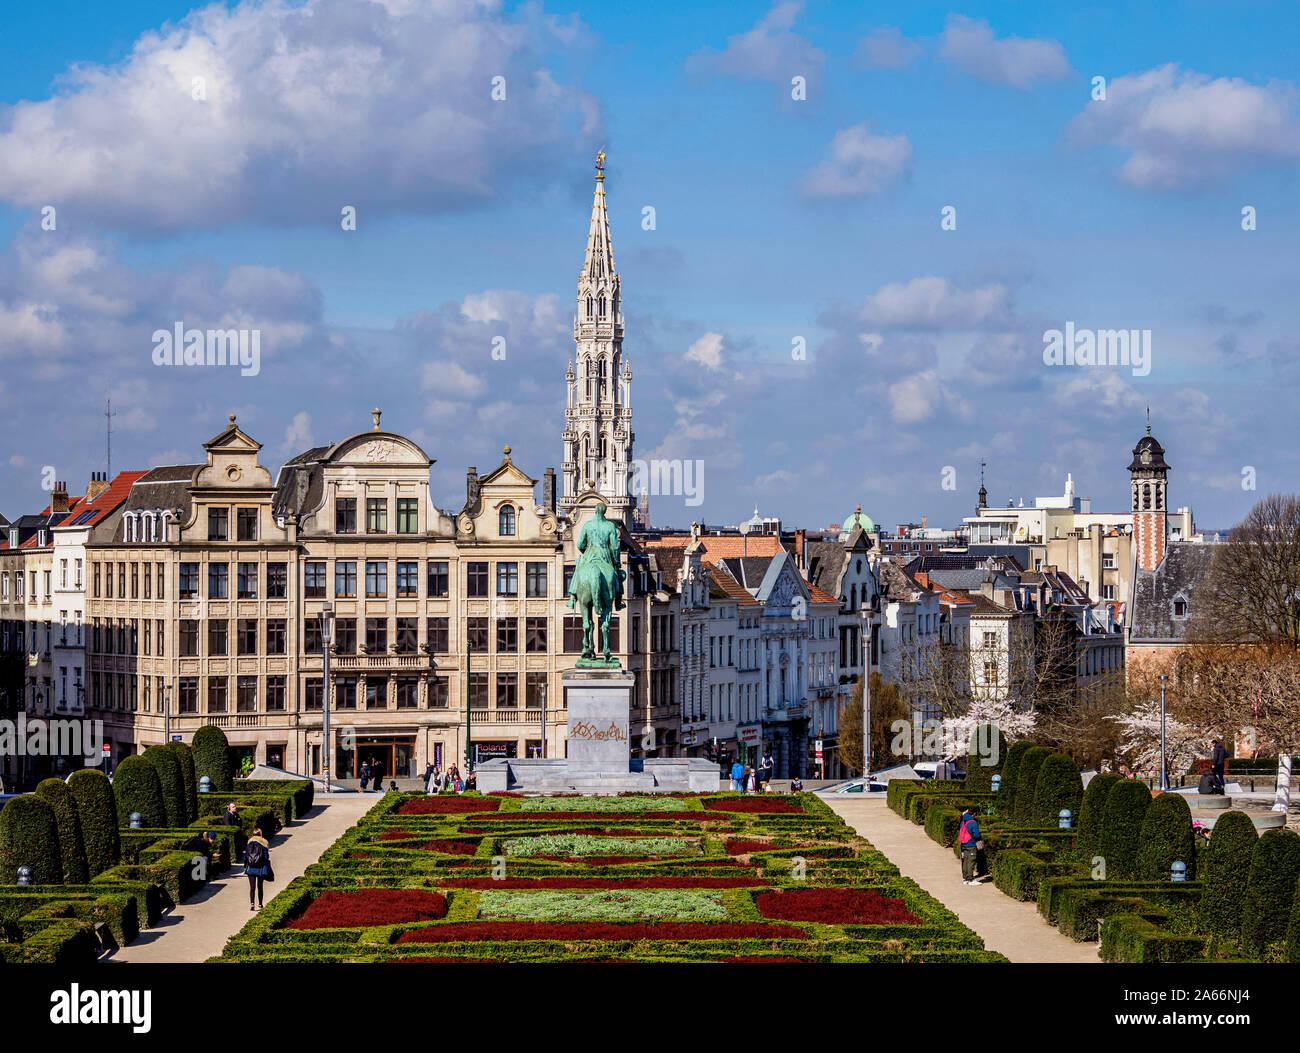 View over Mont des Arts Public Garden towards Town Hall Spire, Brussels, Belgium Stock Photo